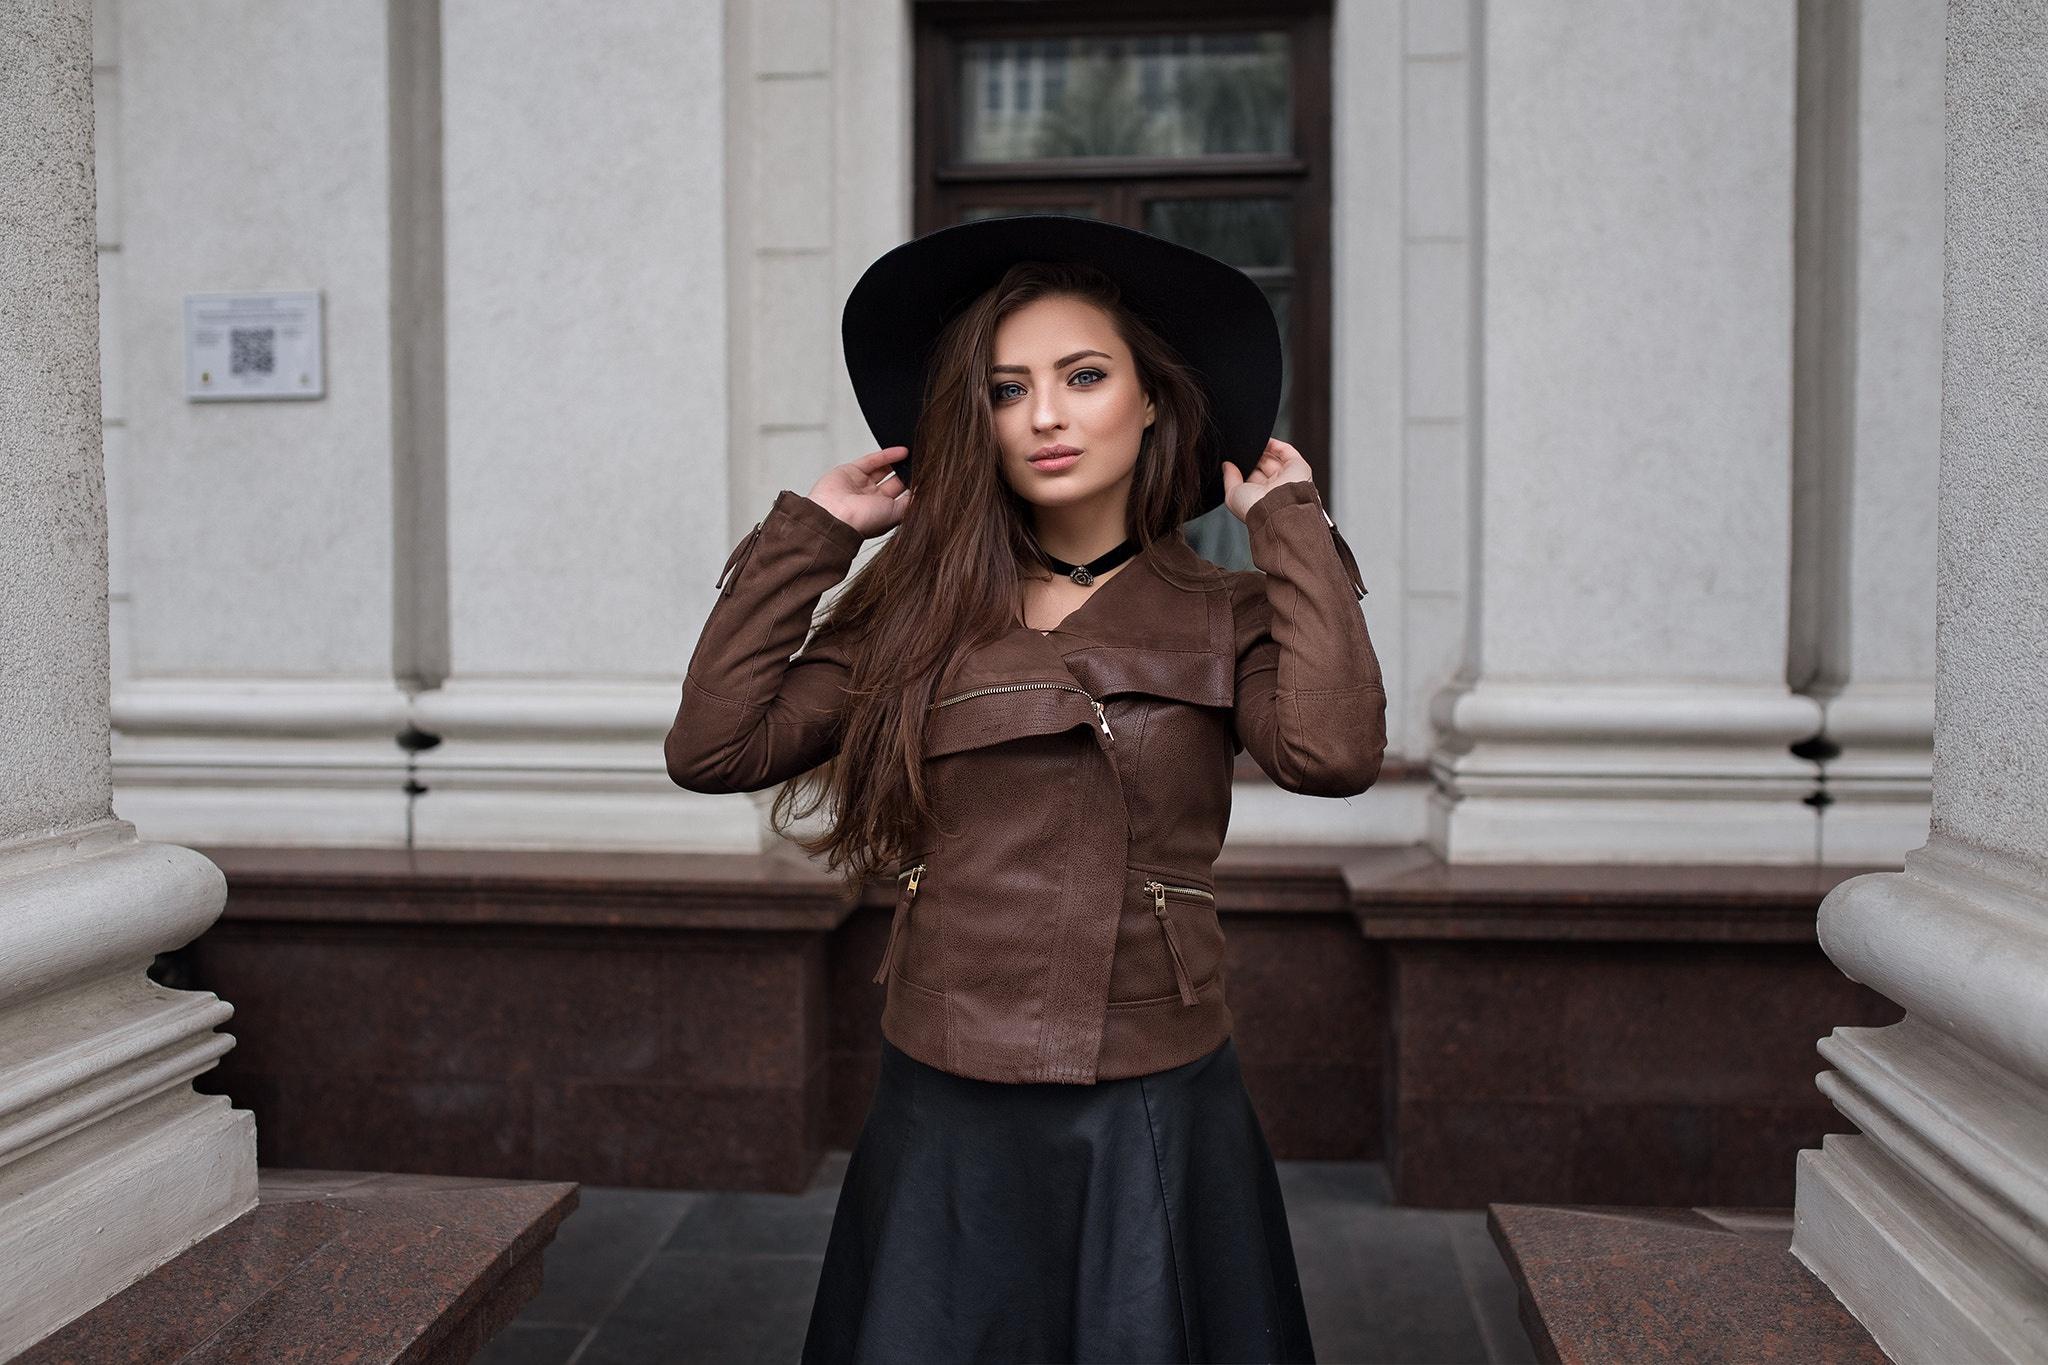 dmitry shulgin black hat model leather jackets black skirts brown jacket leather skirts women veronika avdeeva brunette women with hats veronica (dmitry sn) hat